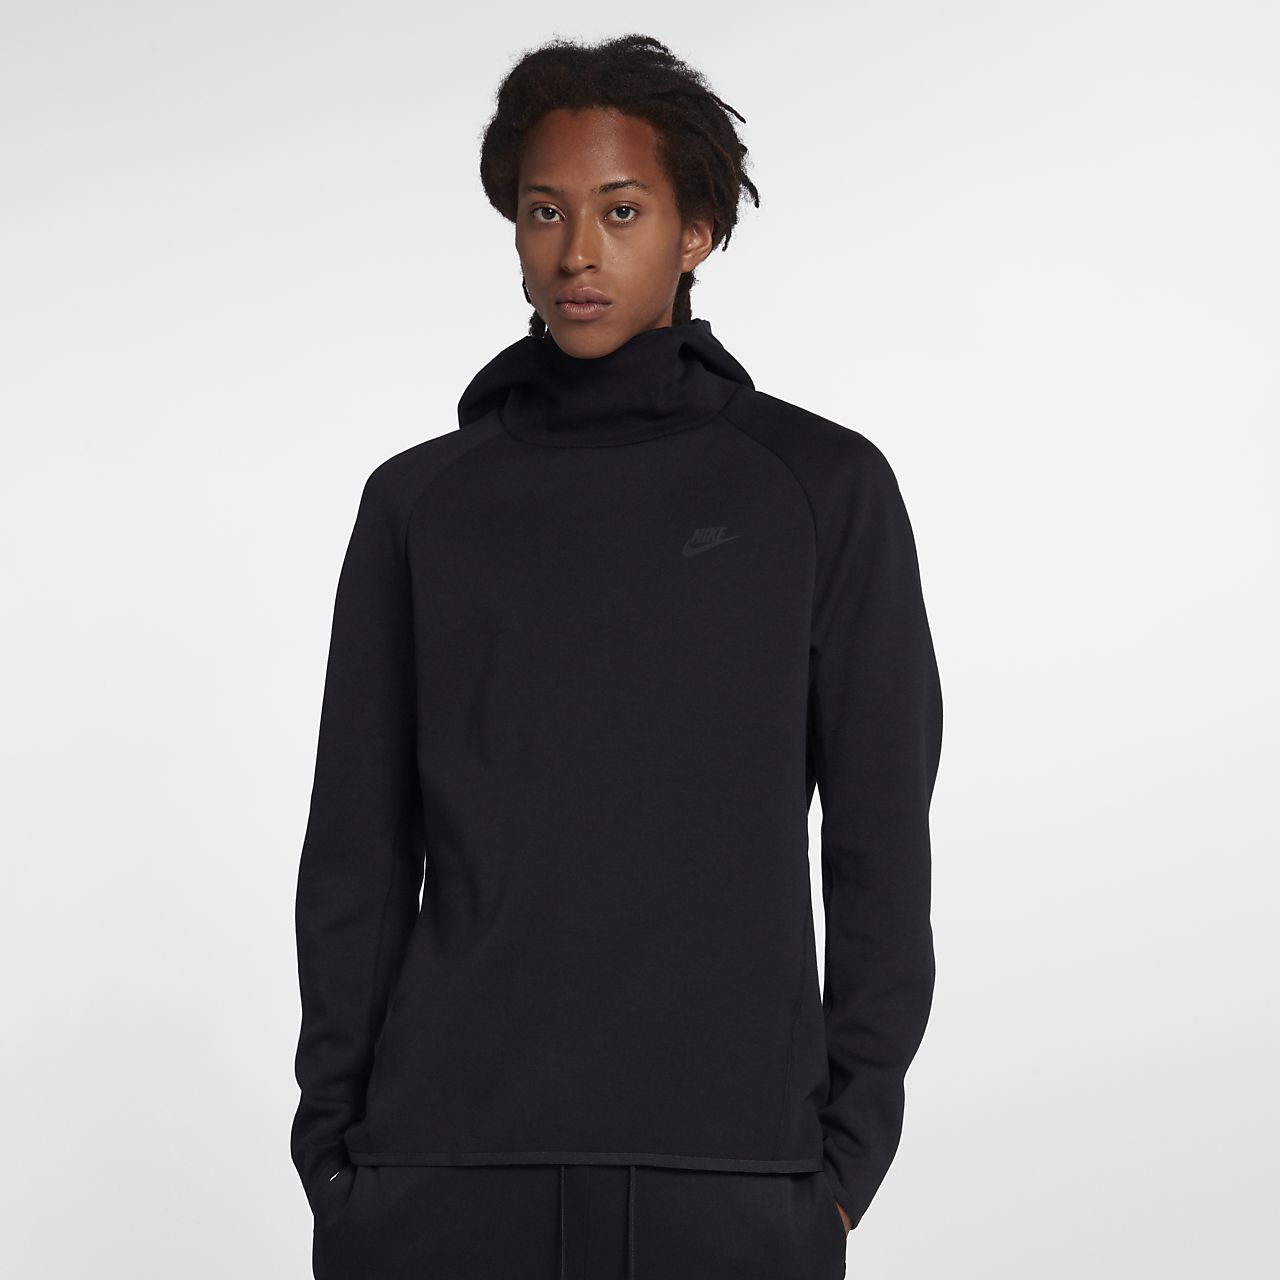 2f63de8f8d386 Nike Sportswear Tech Fleece Sudadera con capucha - Hombre. Nike.com ES